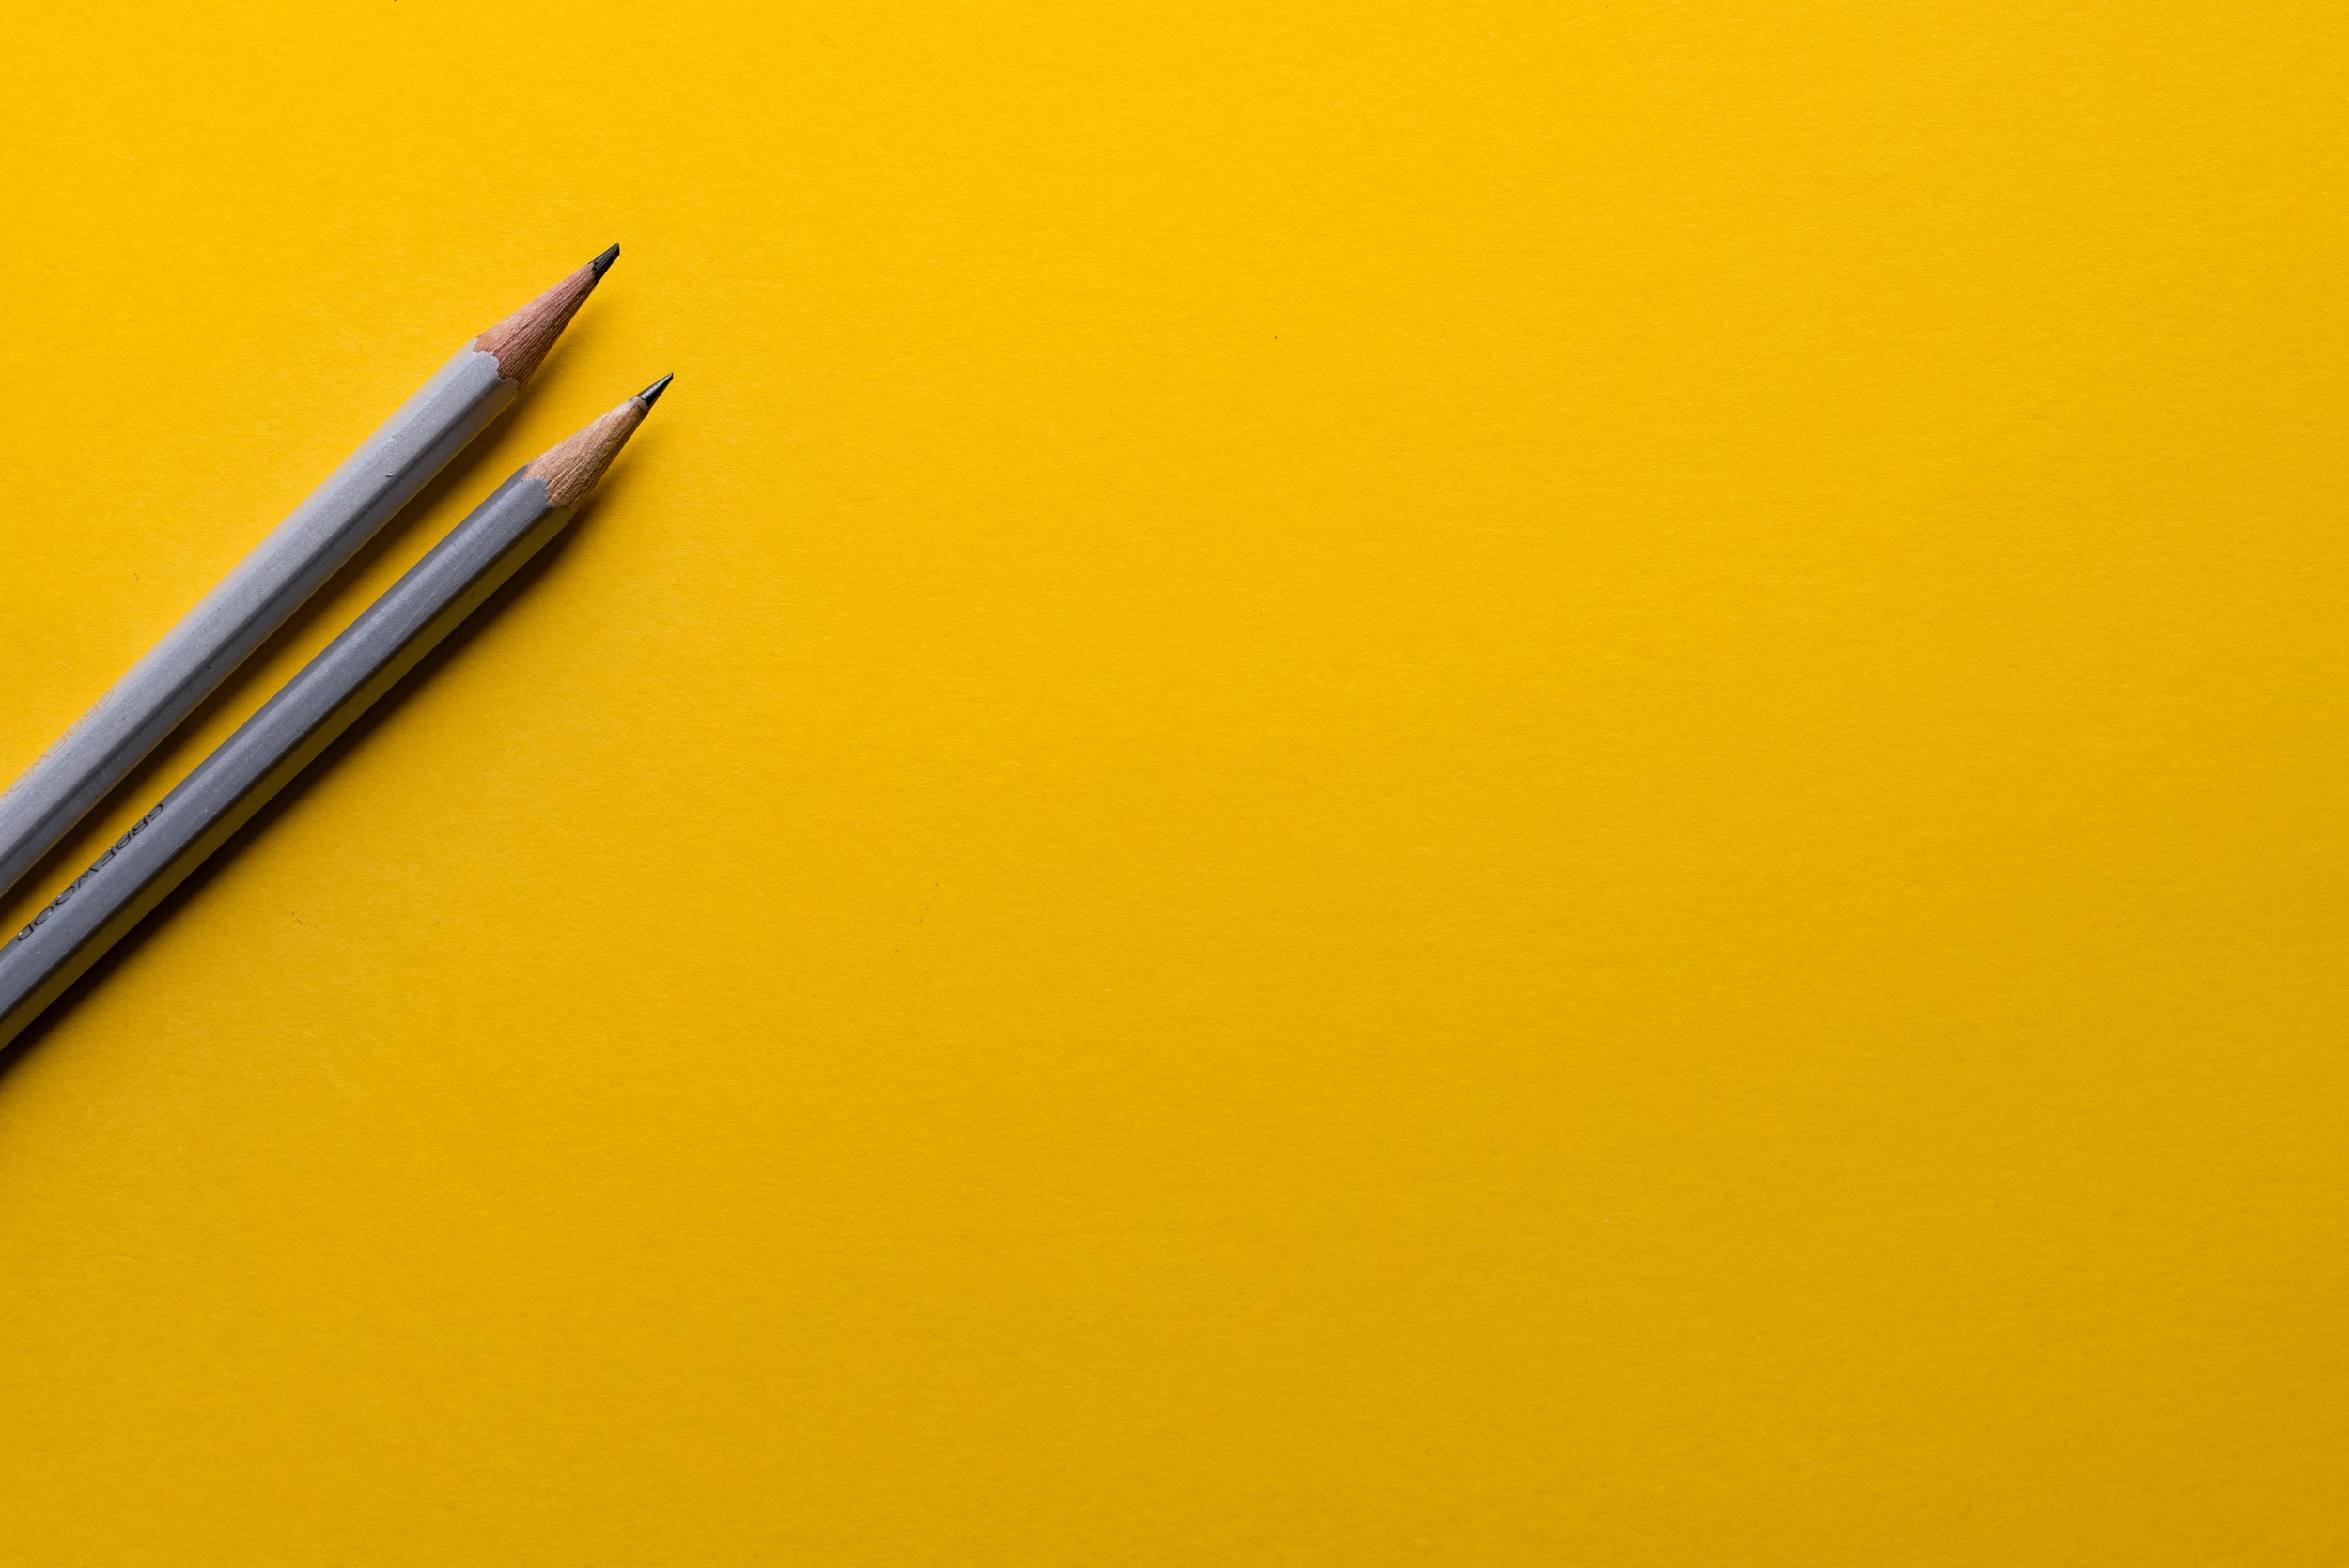 2 pencils.jpg